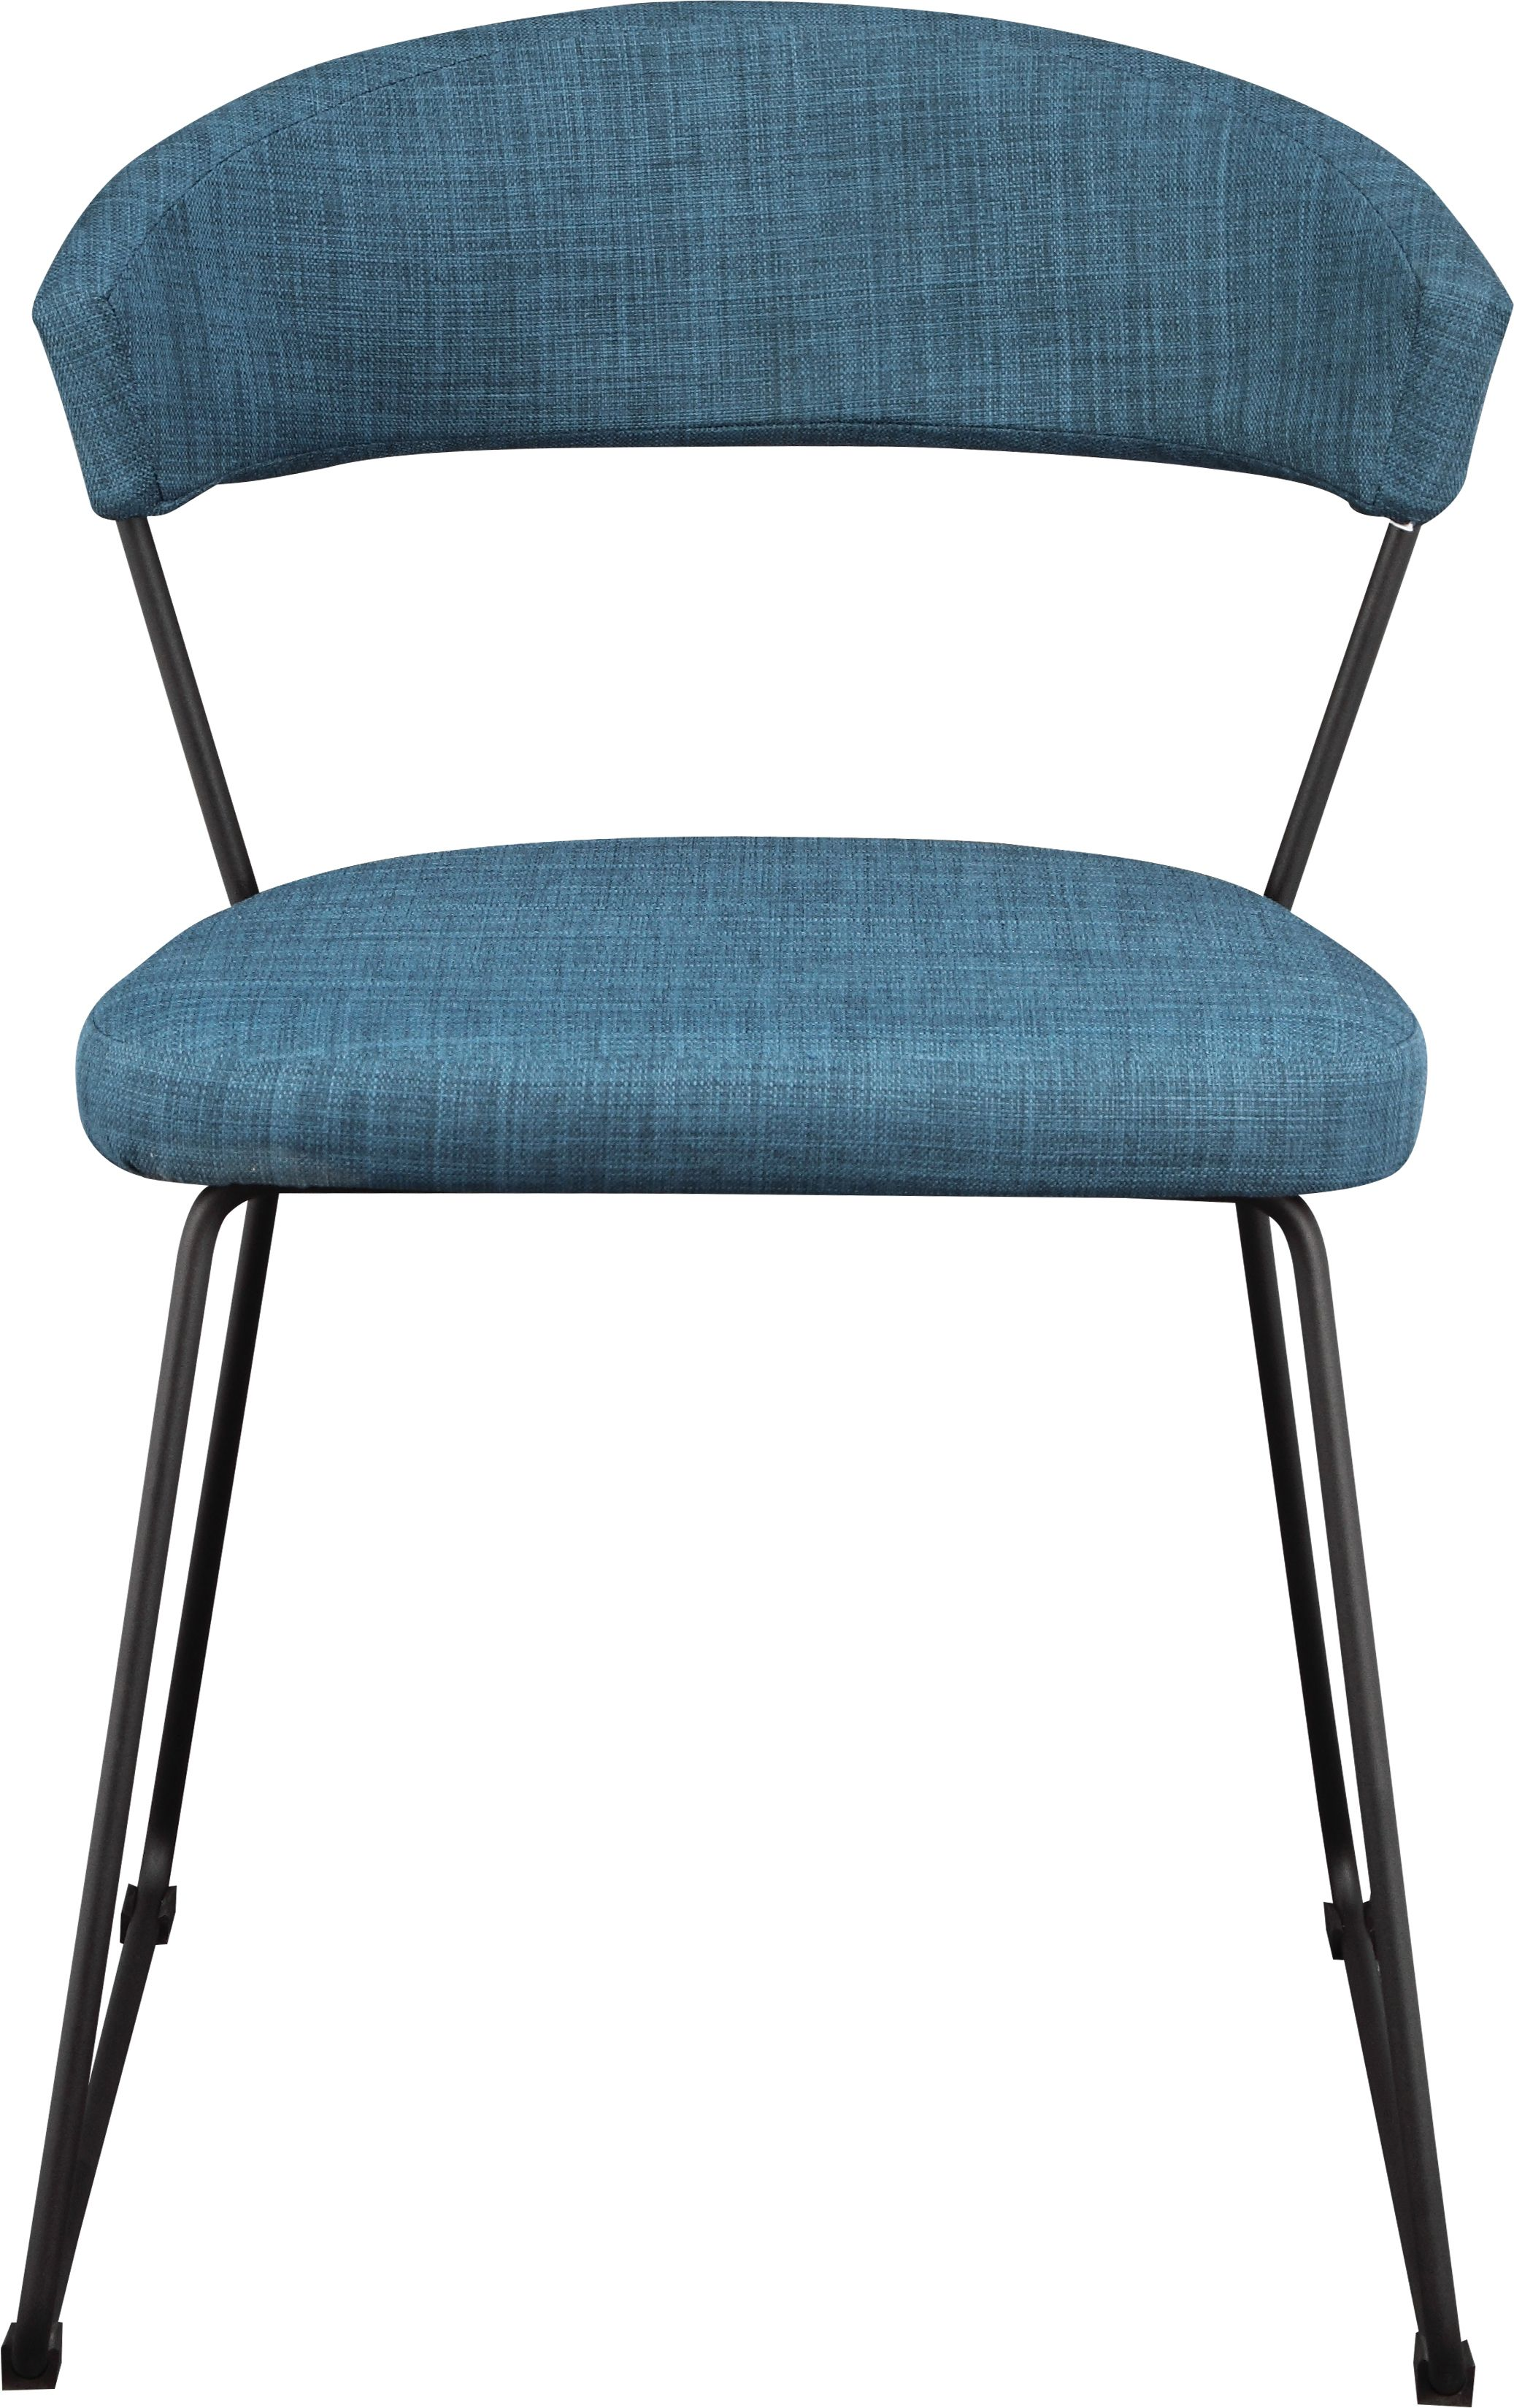 Folding Chair Lulu Vintage Chairs Georgia Orinthia Dining In 2018 Infinity Formal A Modern Powder Coated Black Metal Frame Keeps This S Look Sleek And